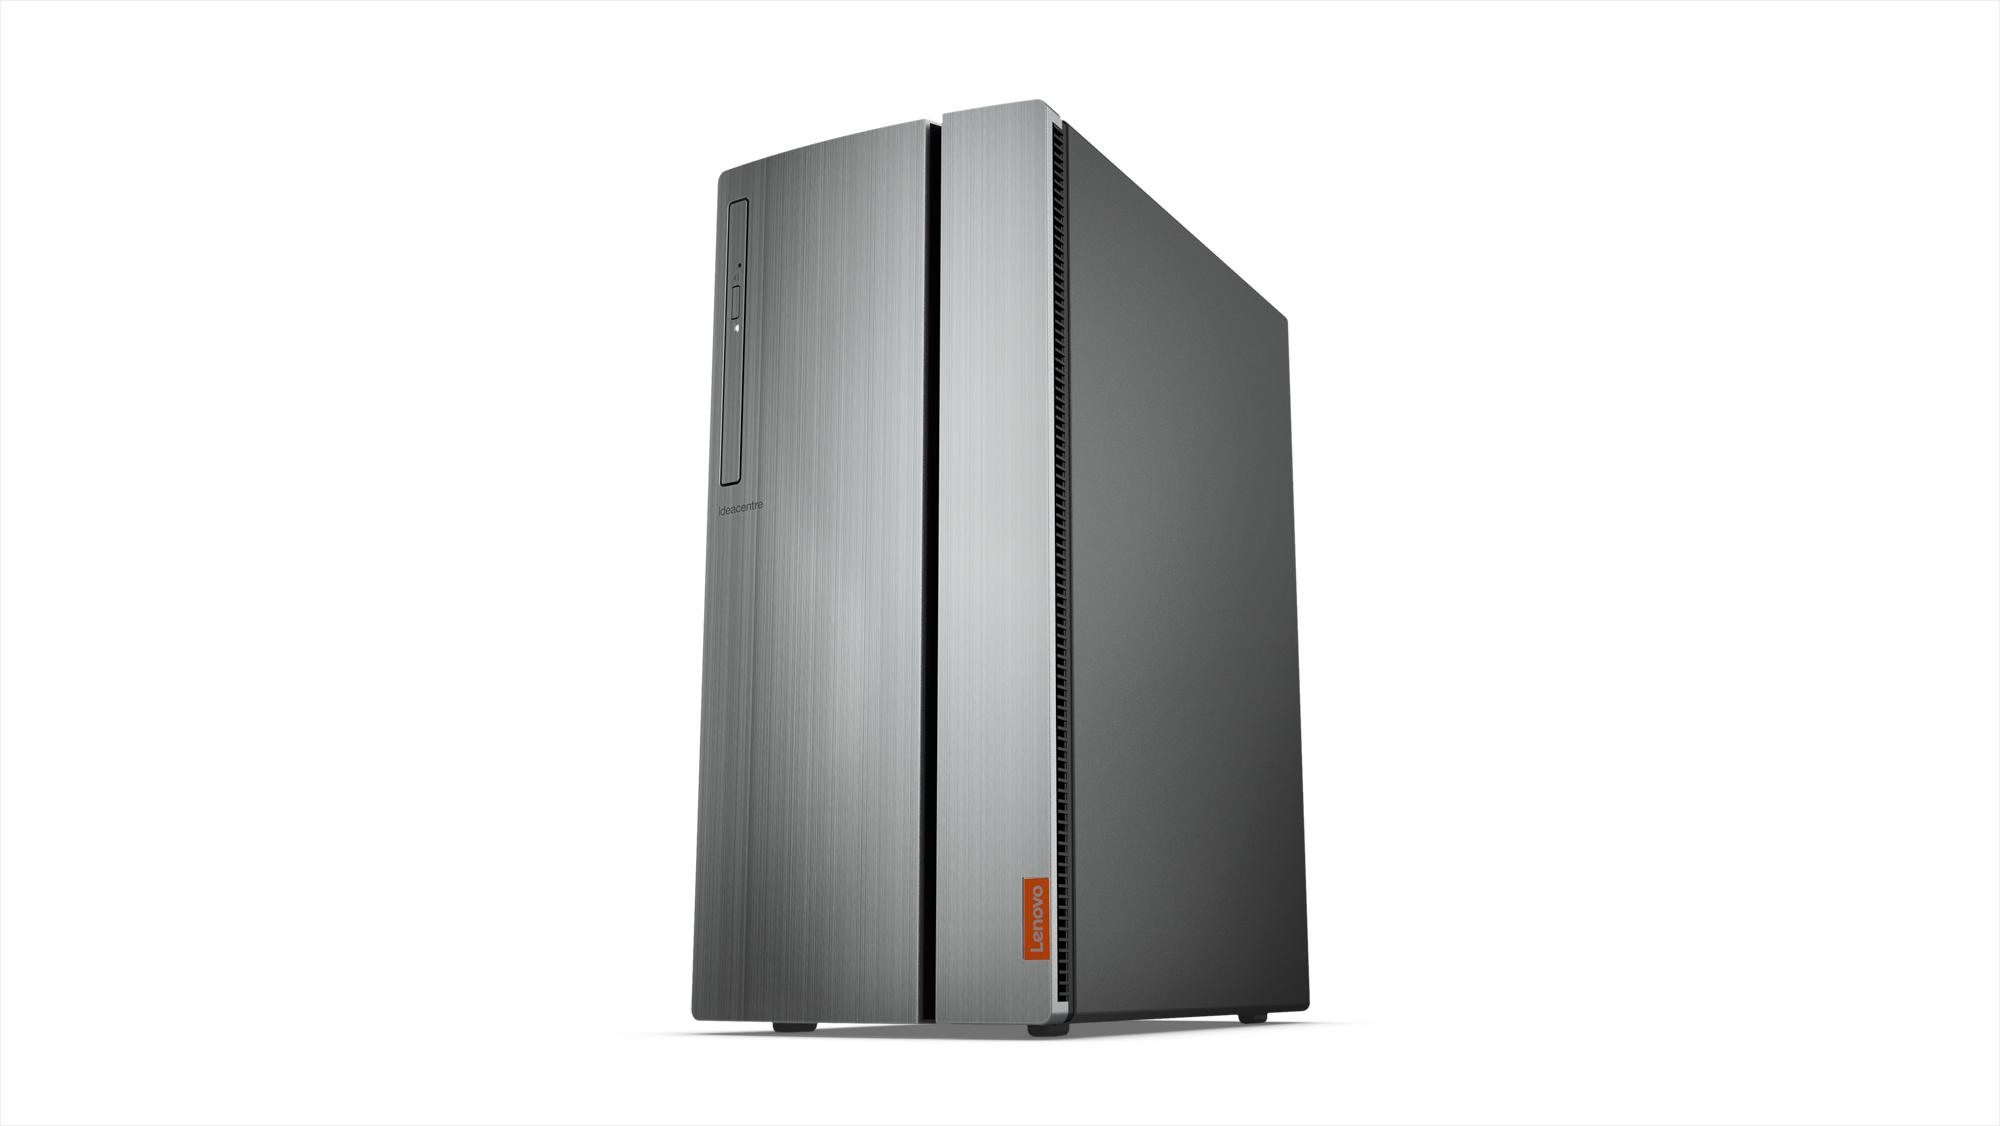 Electronicshop24 Notebooks Computer Tvs Und Vieles Mehr Zu Top Lenovo Ideacentre Aio510 22ish Core I3 7100t 4gb Ddr4 1tb Hd Black 720 18asu Amd Ryzen 5 8gb Rx 560